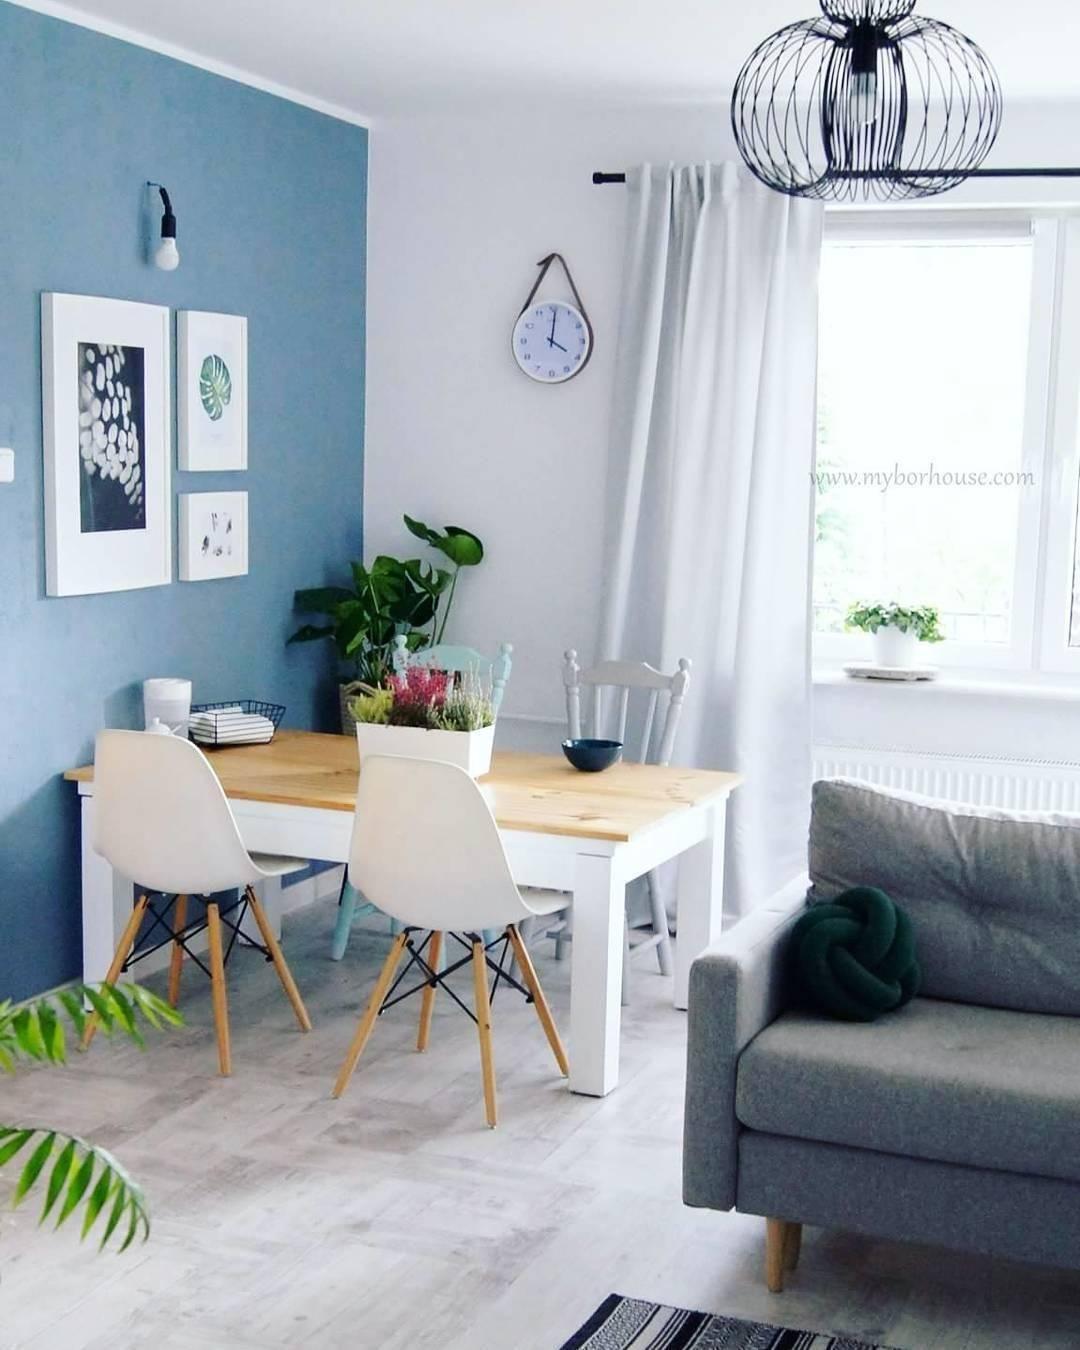 gemeinsam in gem tlicher atmosph re essen daf r ist. Black Bedroom Furniture Sets. Home Design Ideas